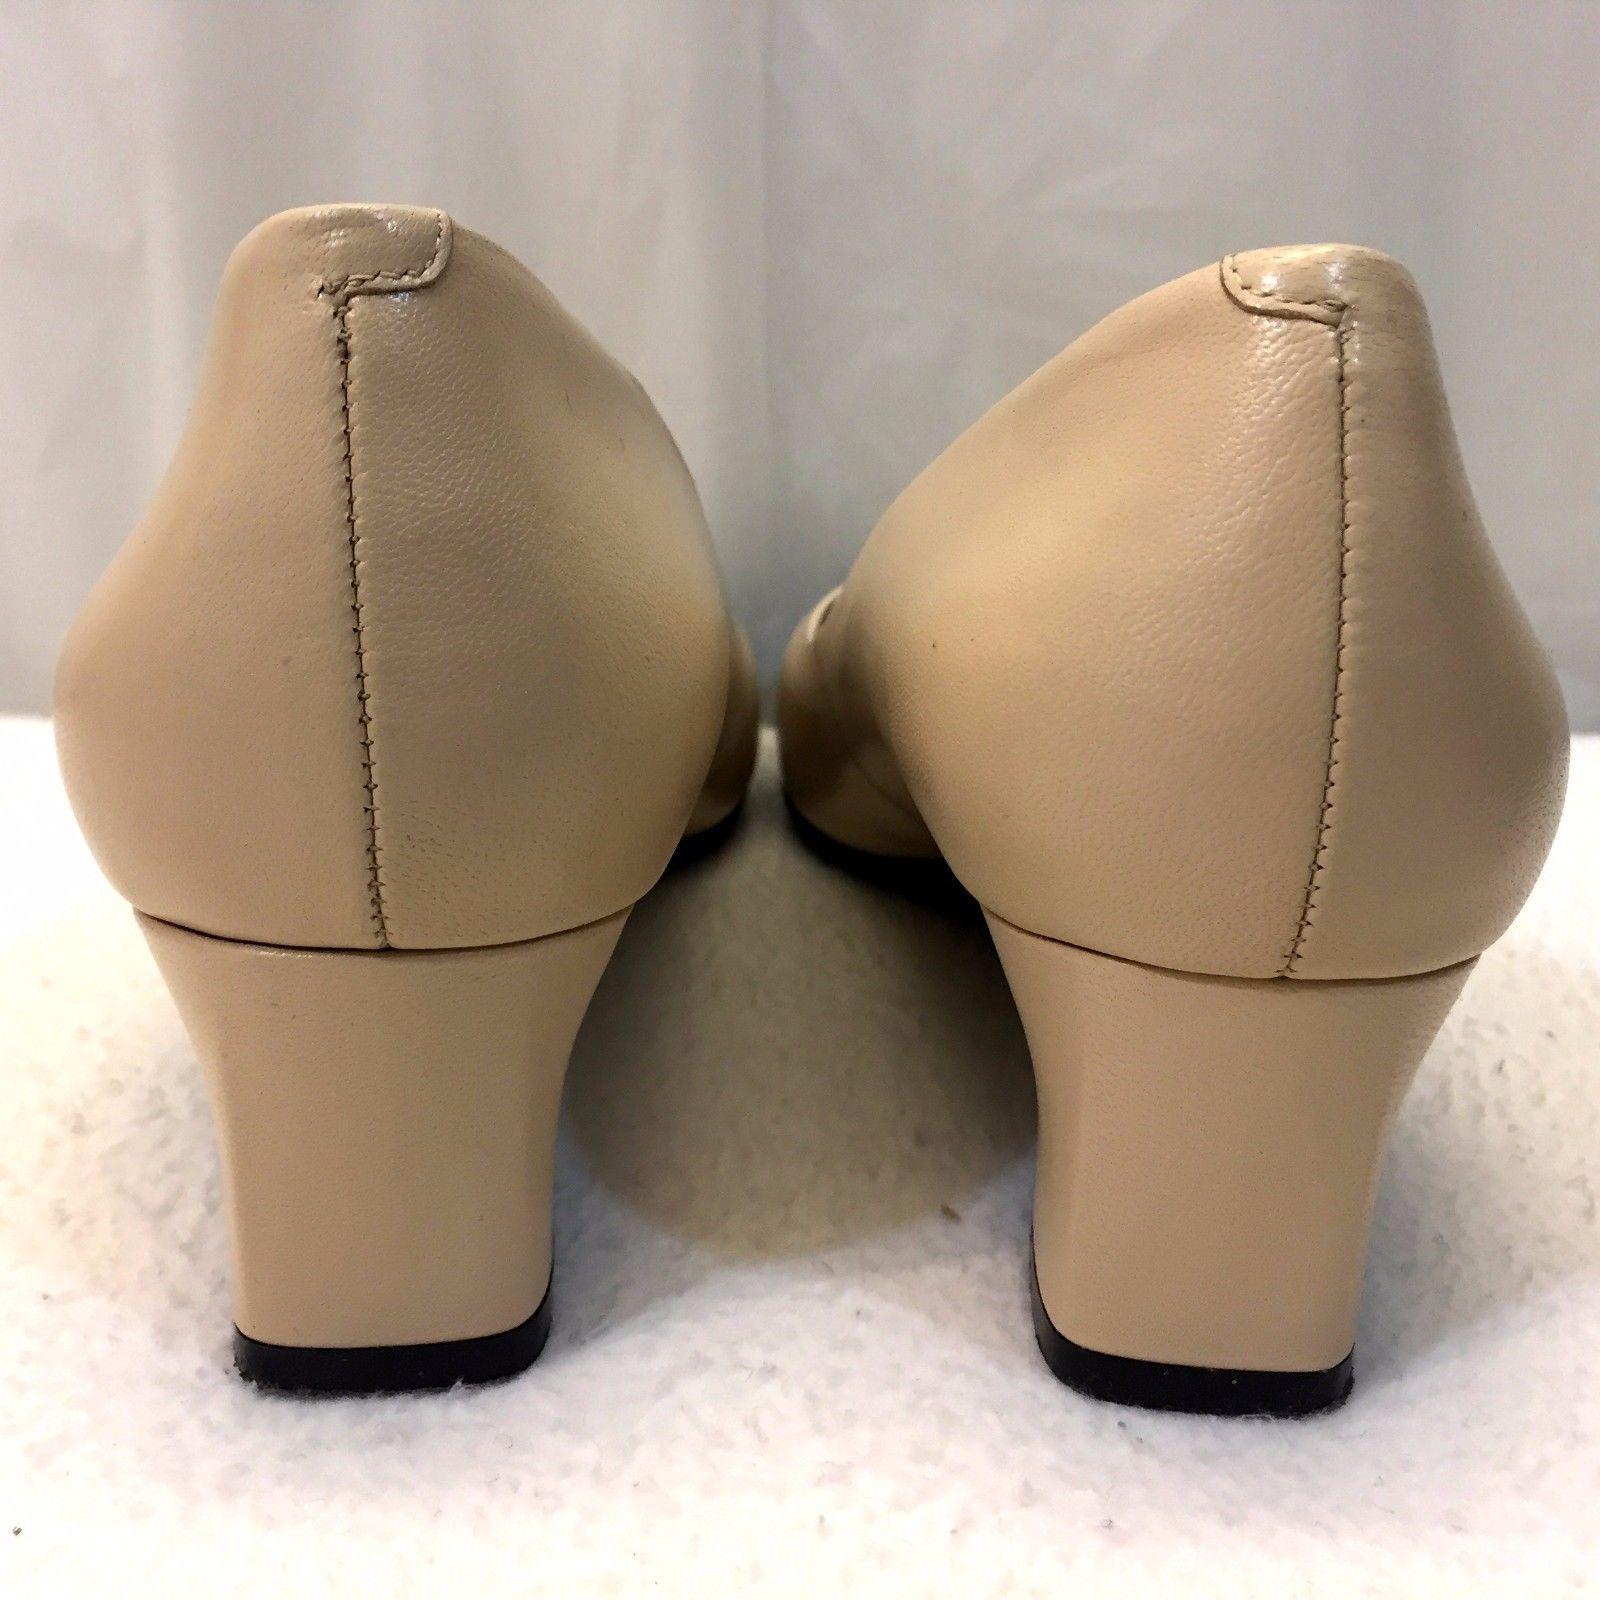 7f8cdceba84 Easy Spirit Pumps Size 8 W Cream Nude Leather 2